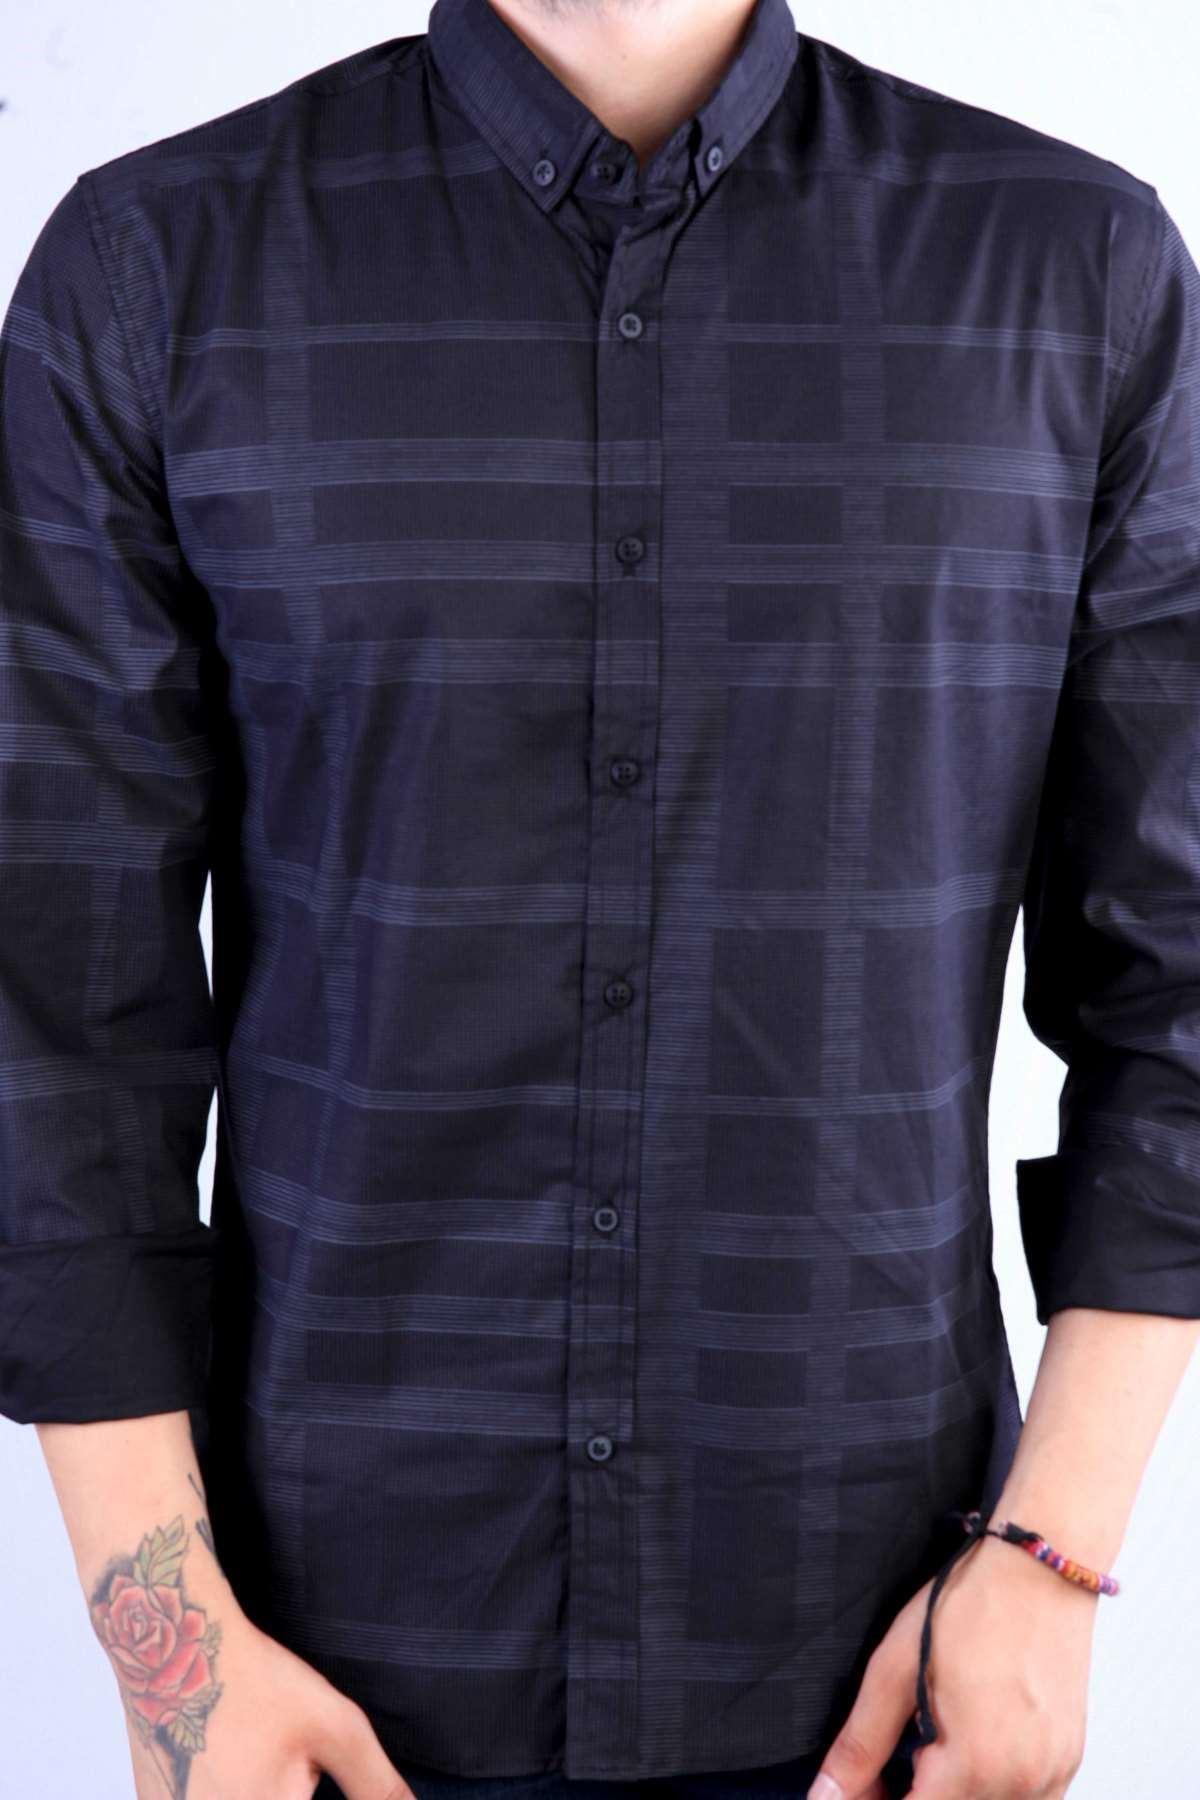 Noktalı Çizgi Desenli Klasik Yaka Slim Fit Gömlek Siyah